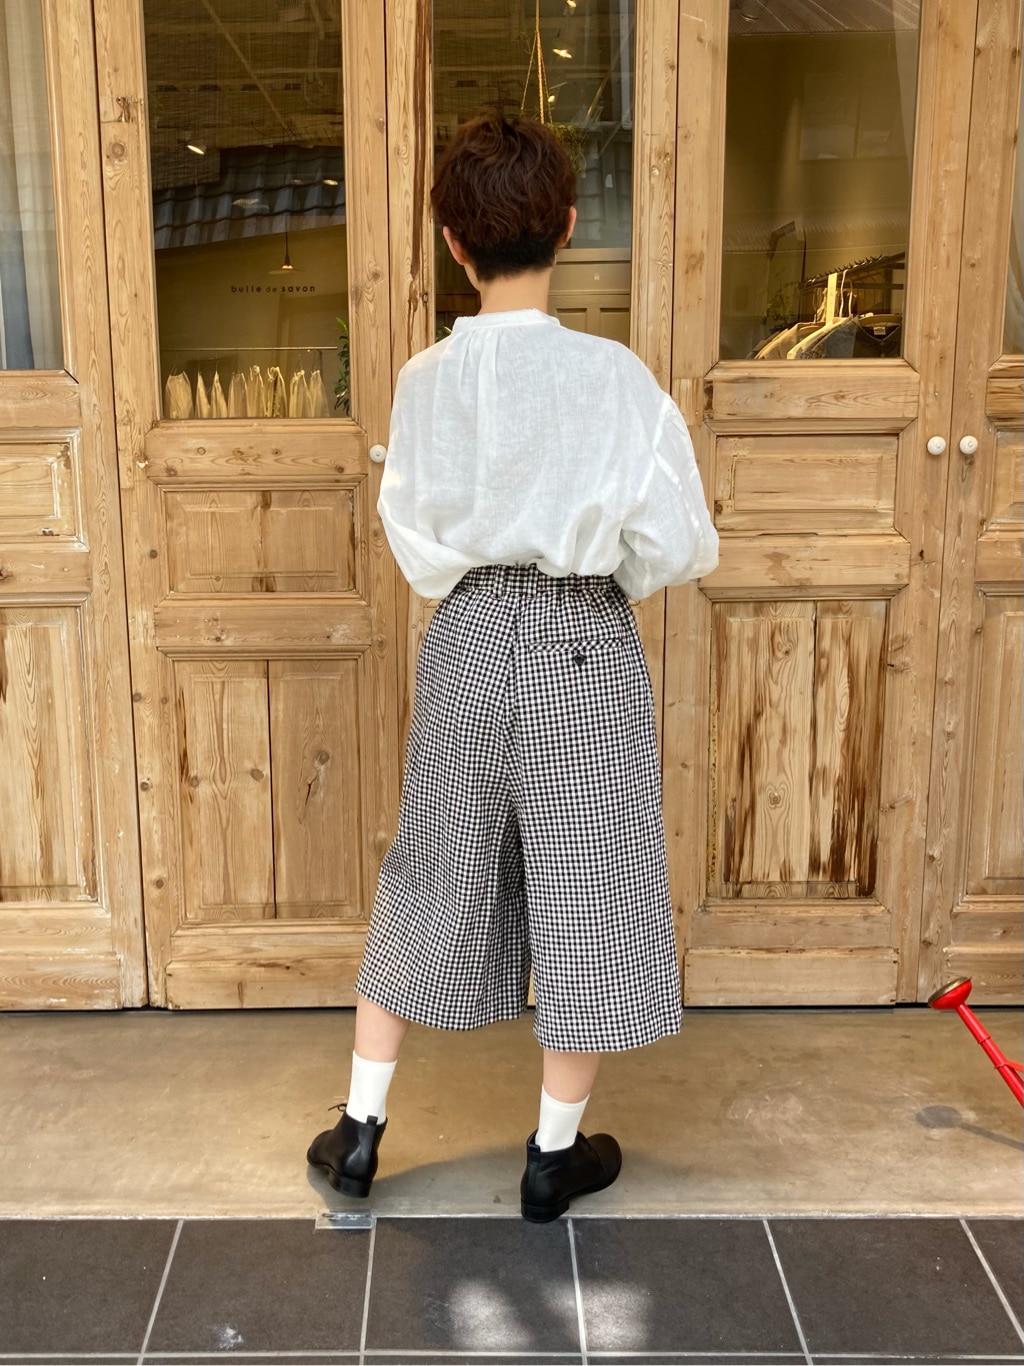 yuni / bulle de savon 京都路面 身長:159cm 2021.02.17